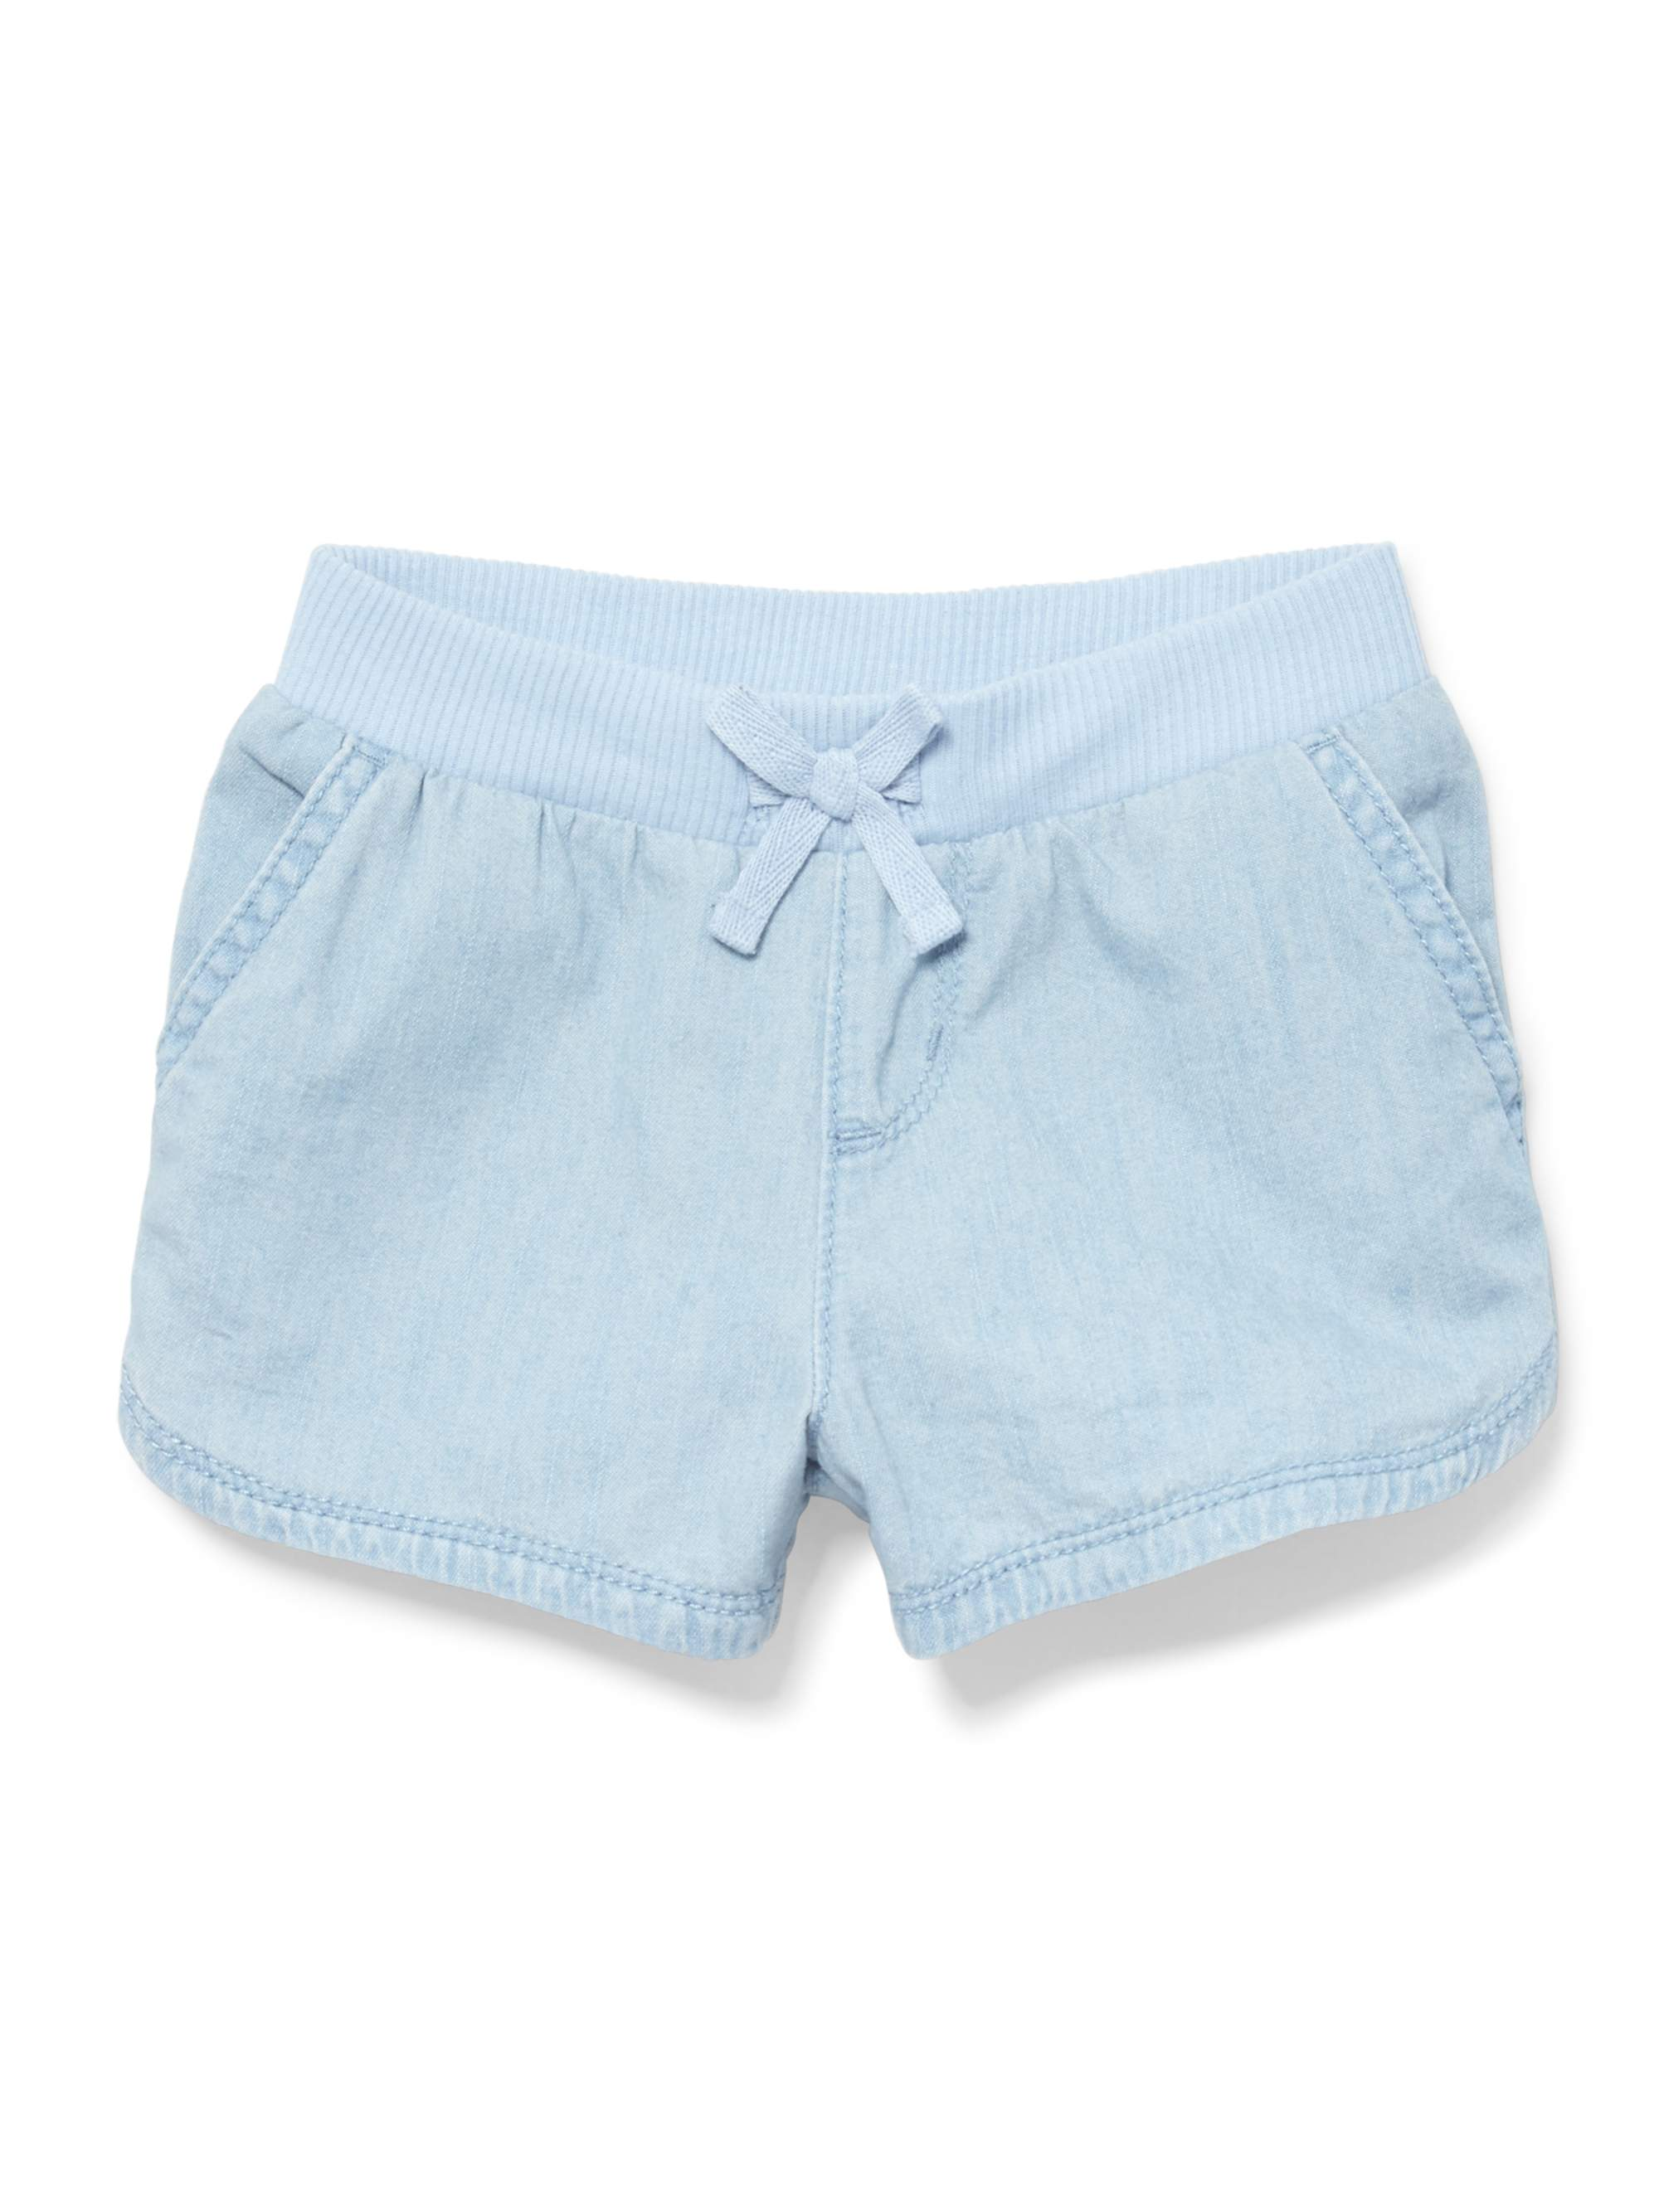 Chambray Knit Shorts (Baby Girls & Toddler Girls)